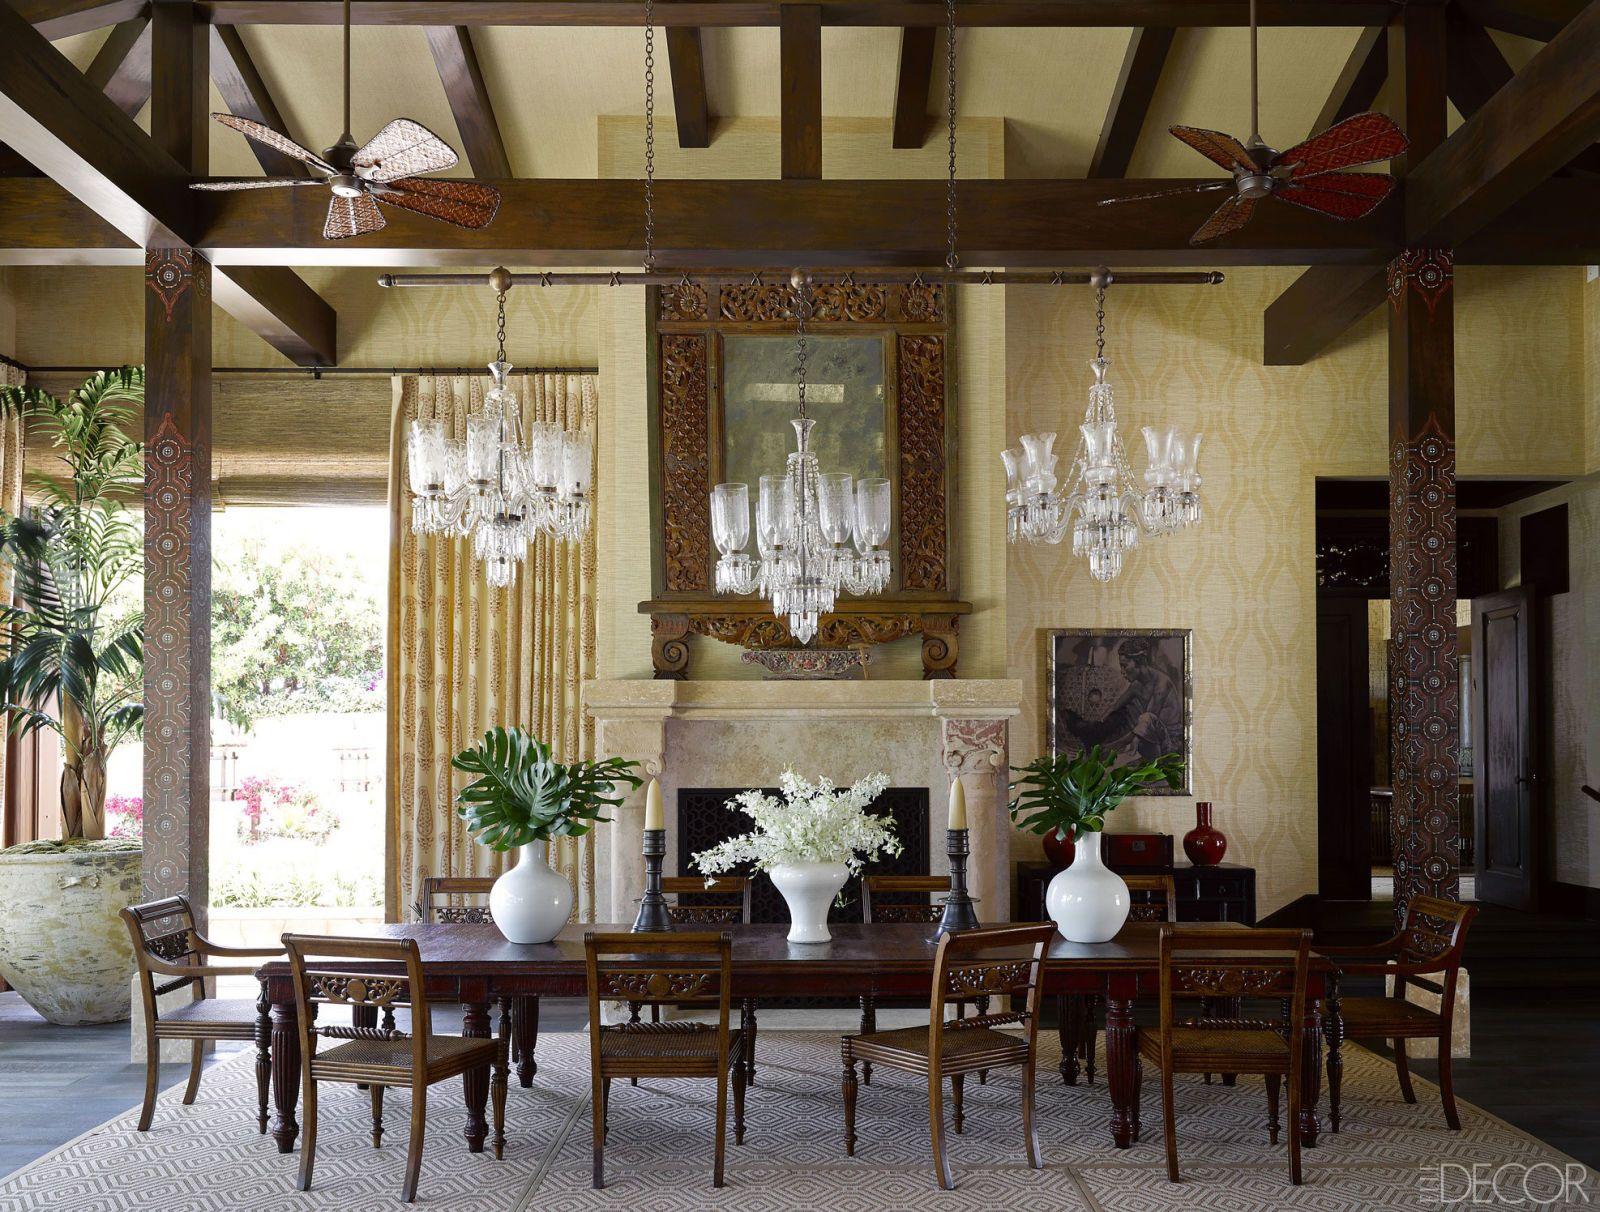 stunning dining rooms for holiday hosting interior design ideas